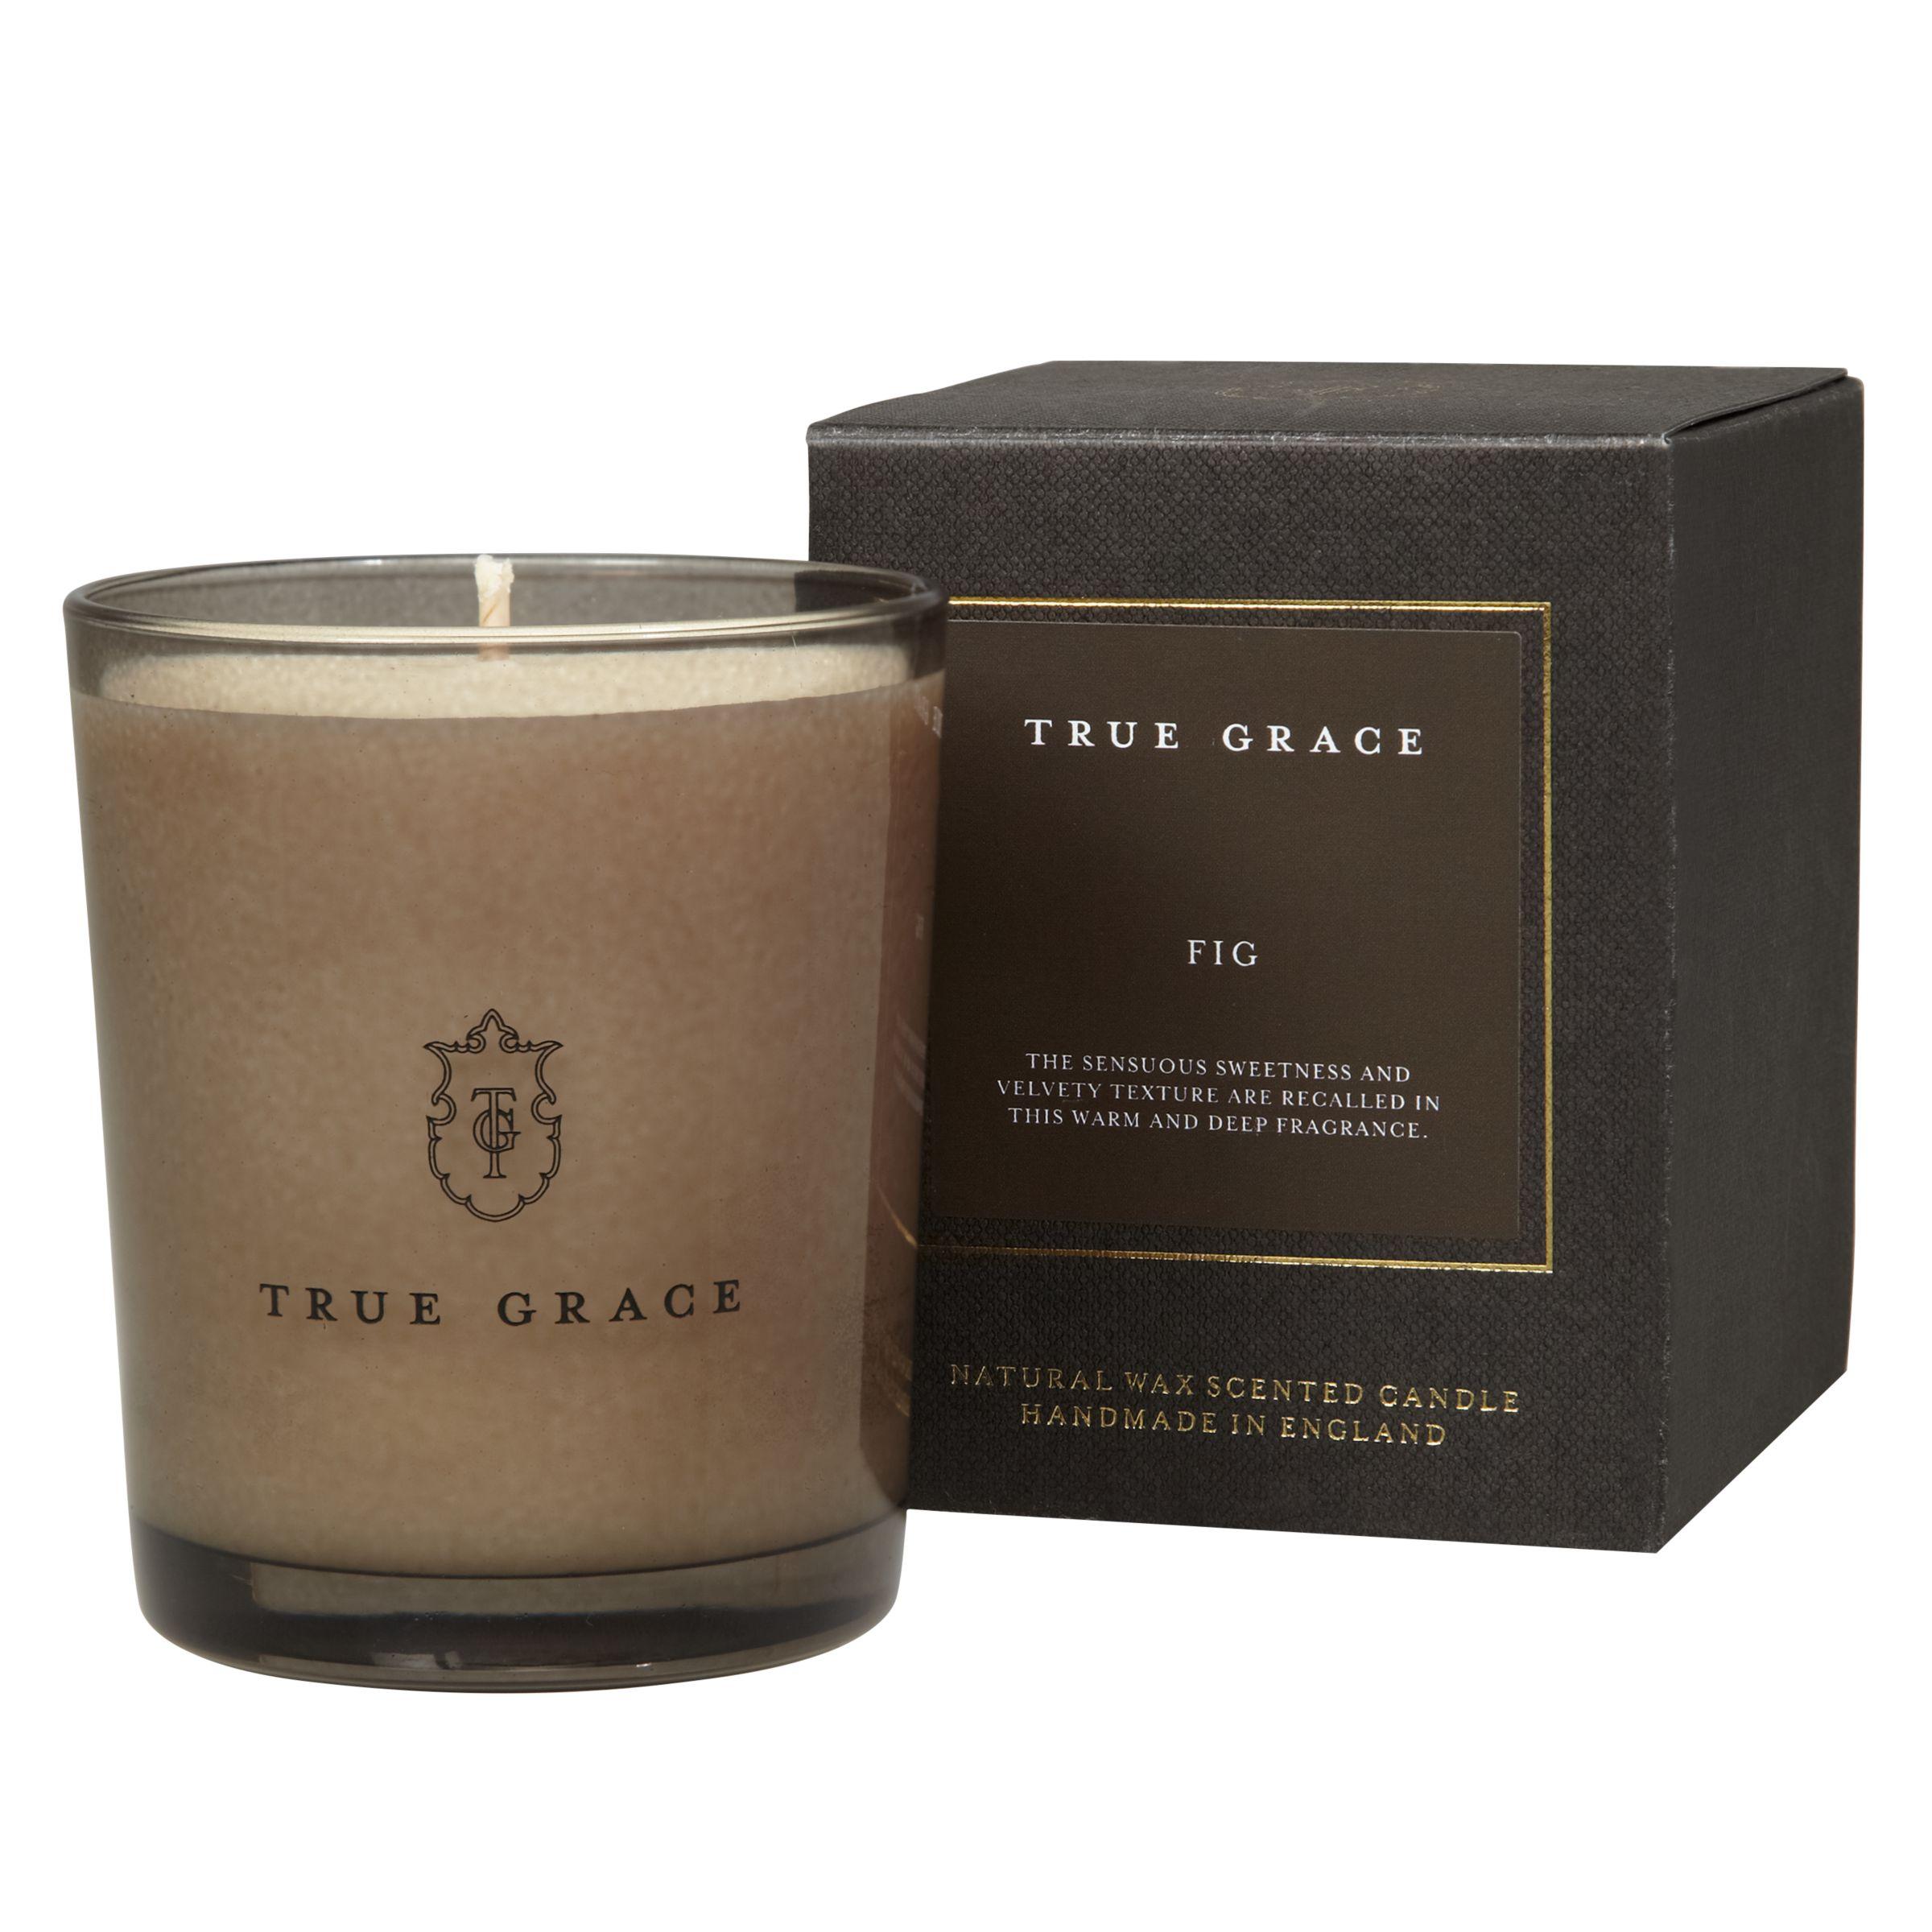 True Grace True Grace Manor Fig Scented Candle